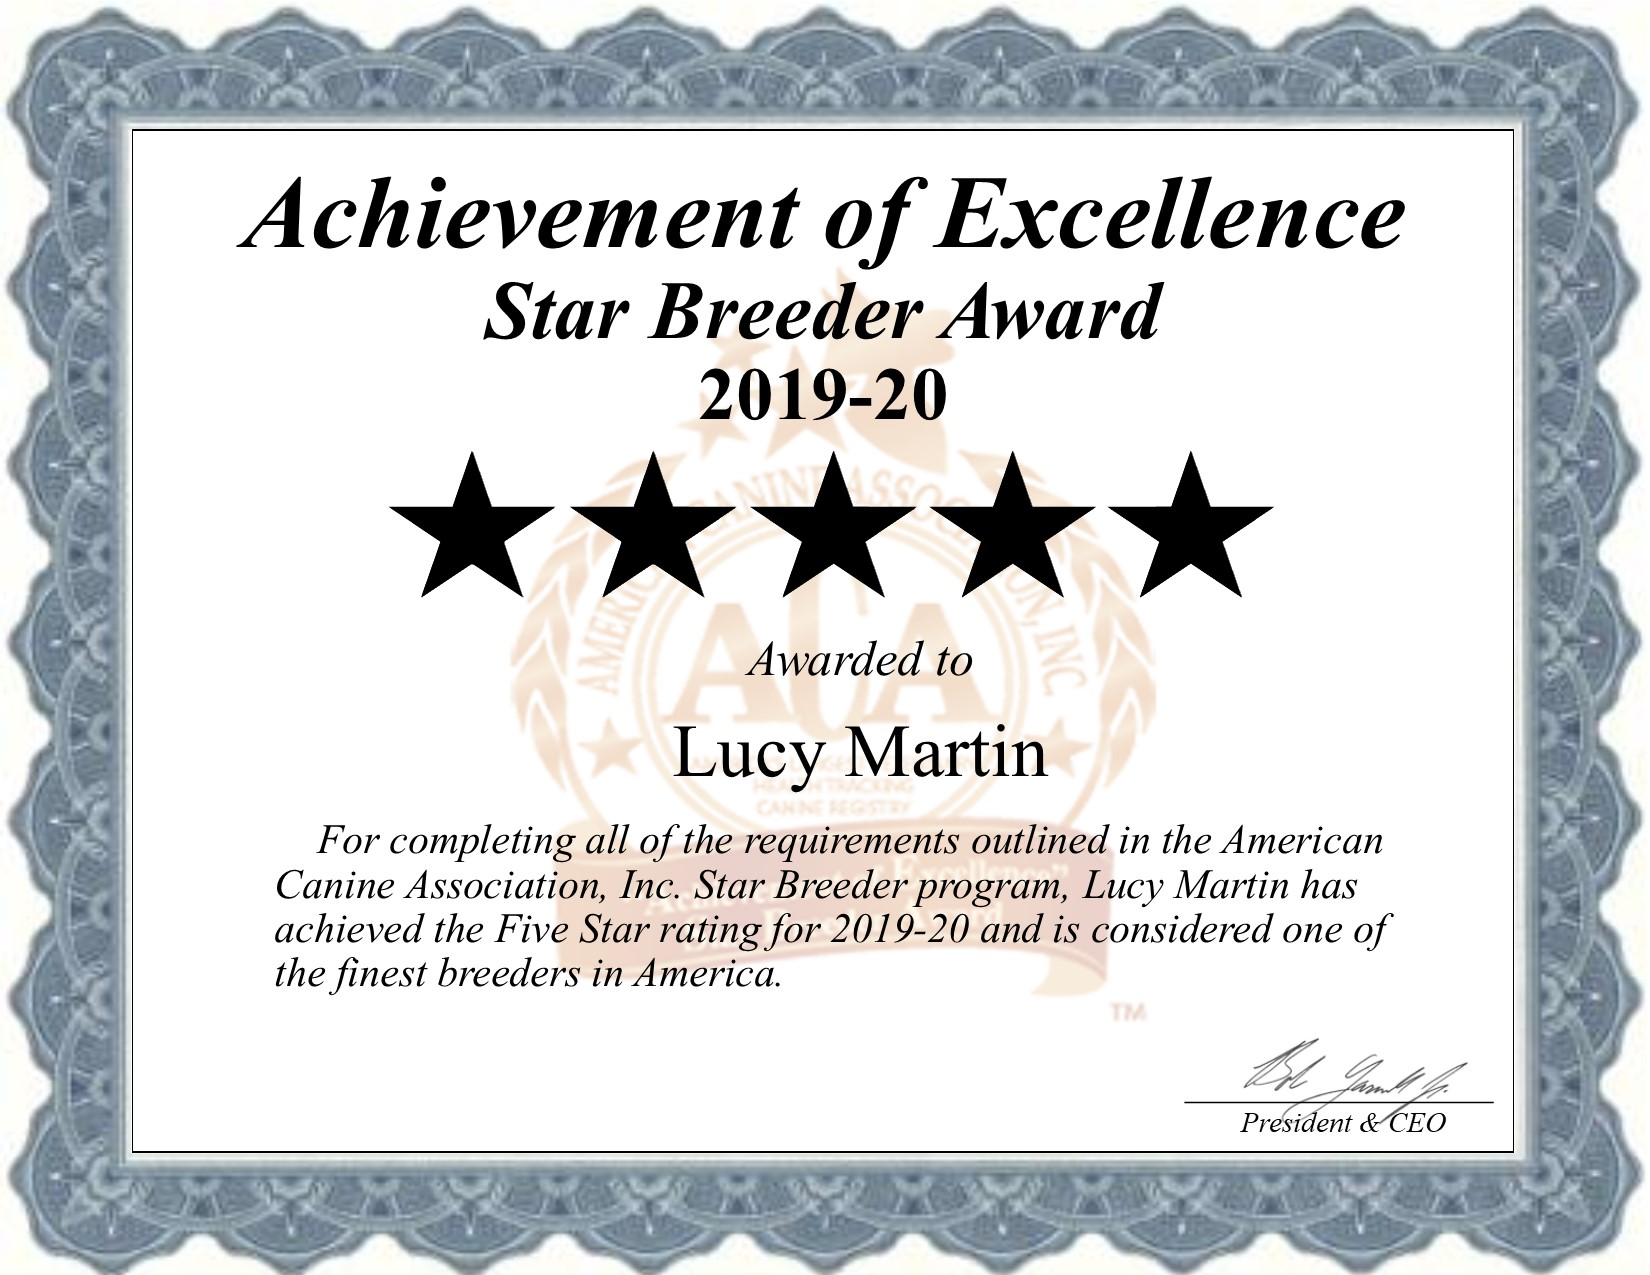 Lucy, Martin, dog, breeder, certificate, lucy-martin, dog-breeder, puppies, Martin Kennel, star, breeder, star-breeder, 5 star, USDA, Pennsylvania, PA, East Earl, dog, puppy, ACA, ica, 2016